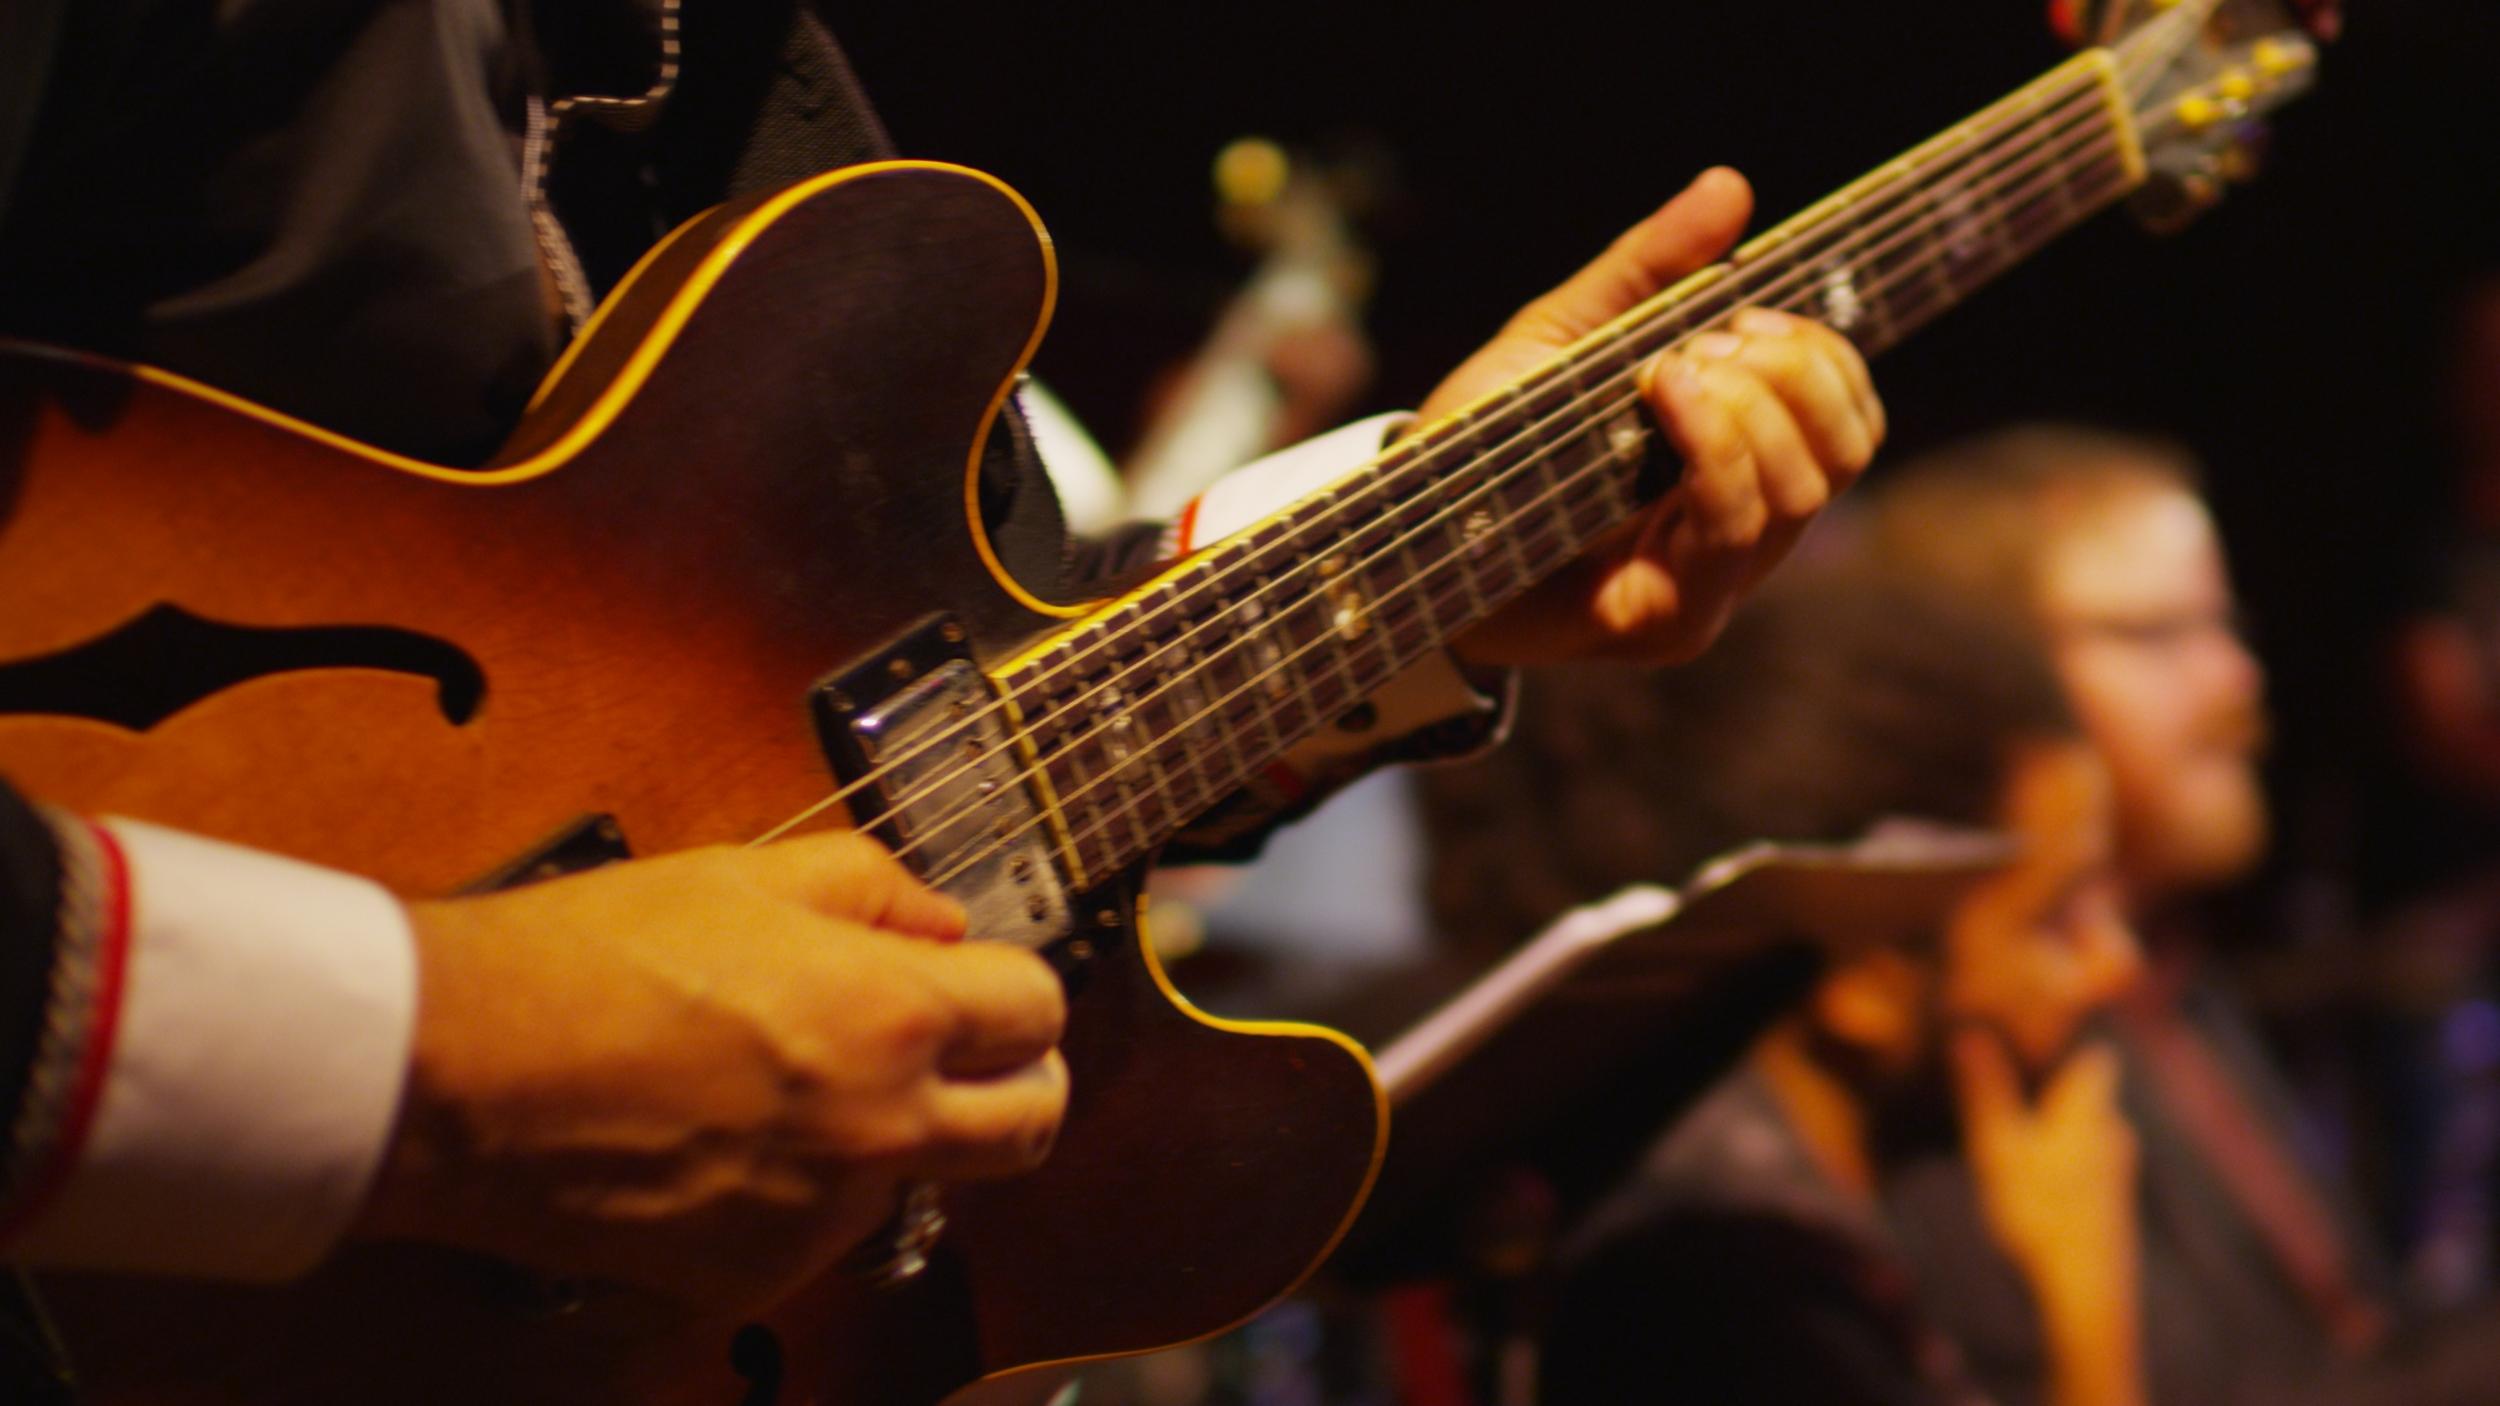 guitar.0001292.jpg